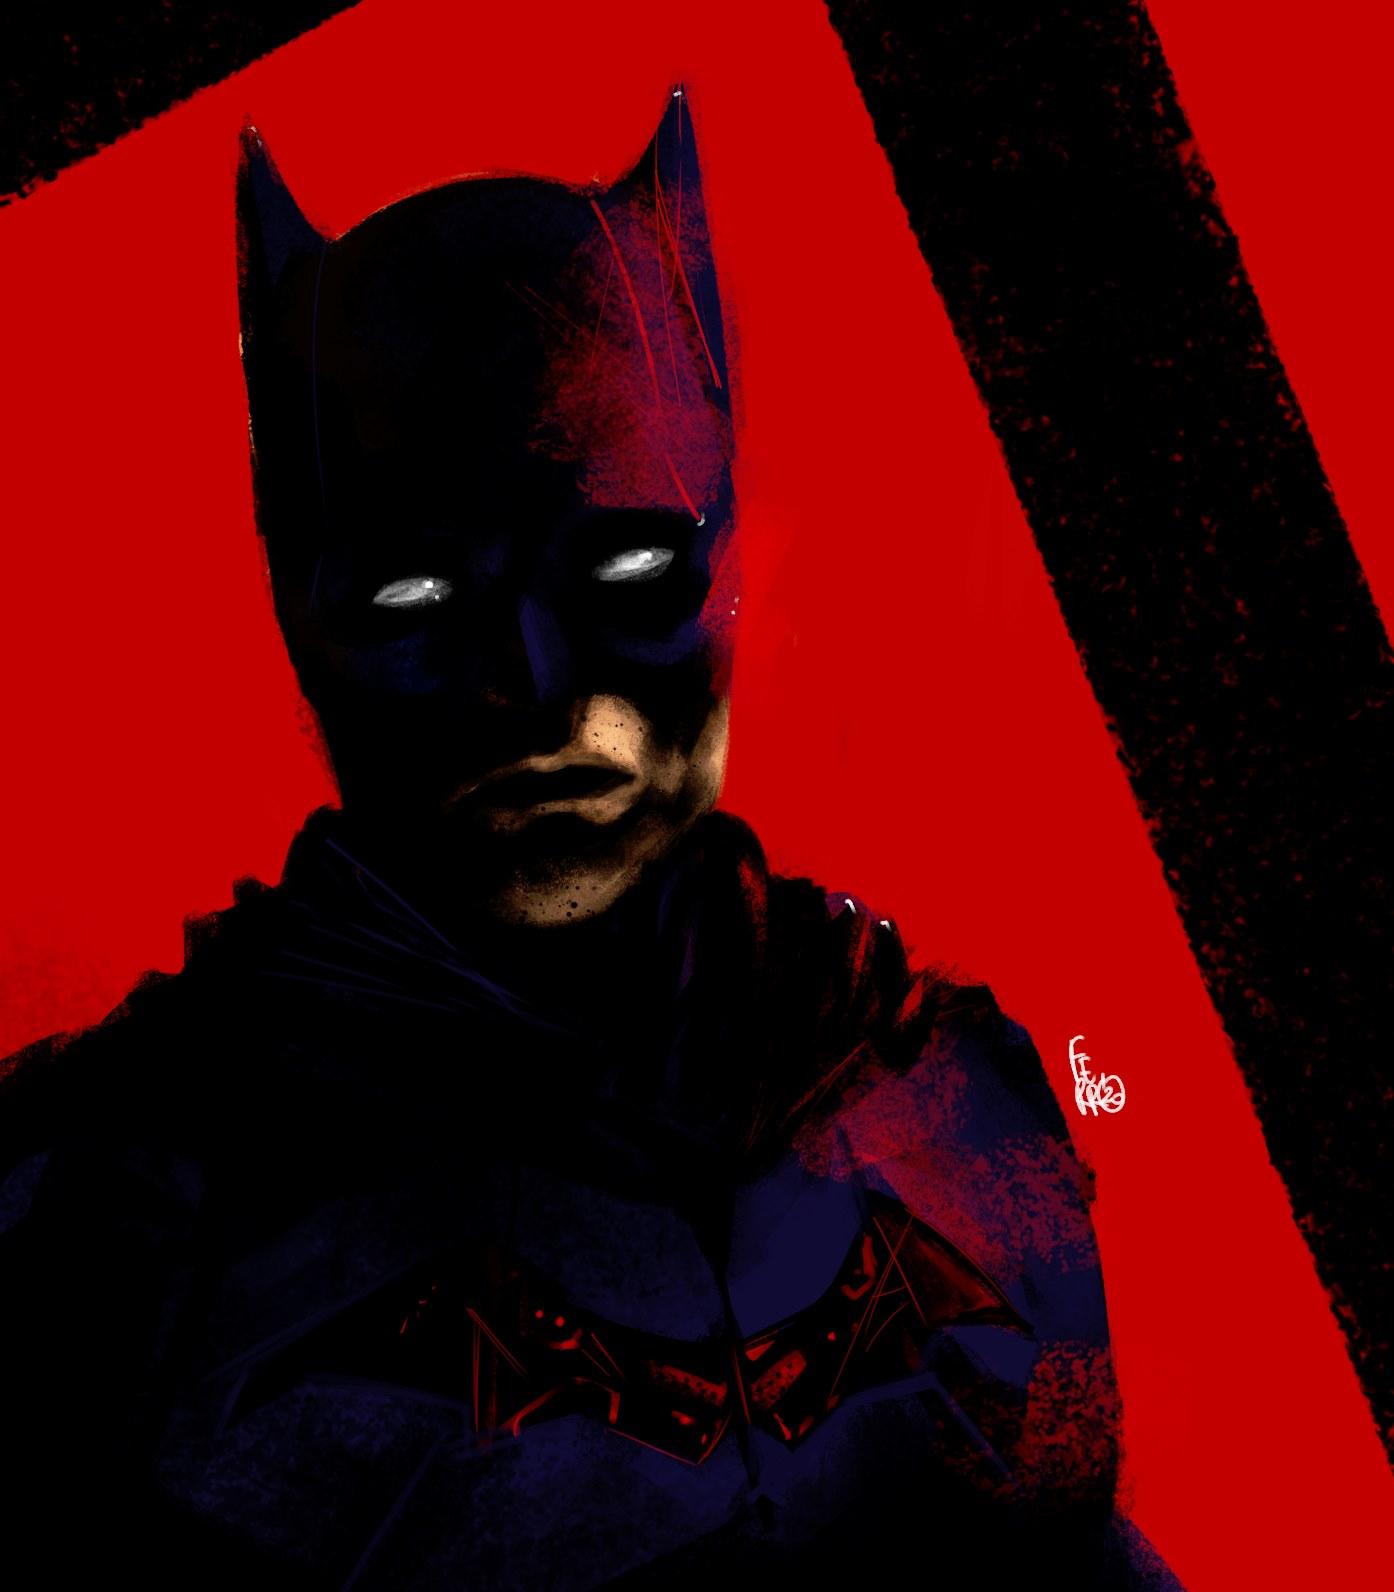 Riccardo Ferrari - The Batman (2020)